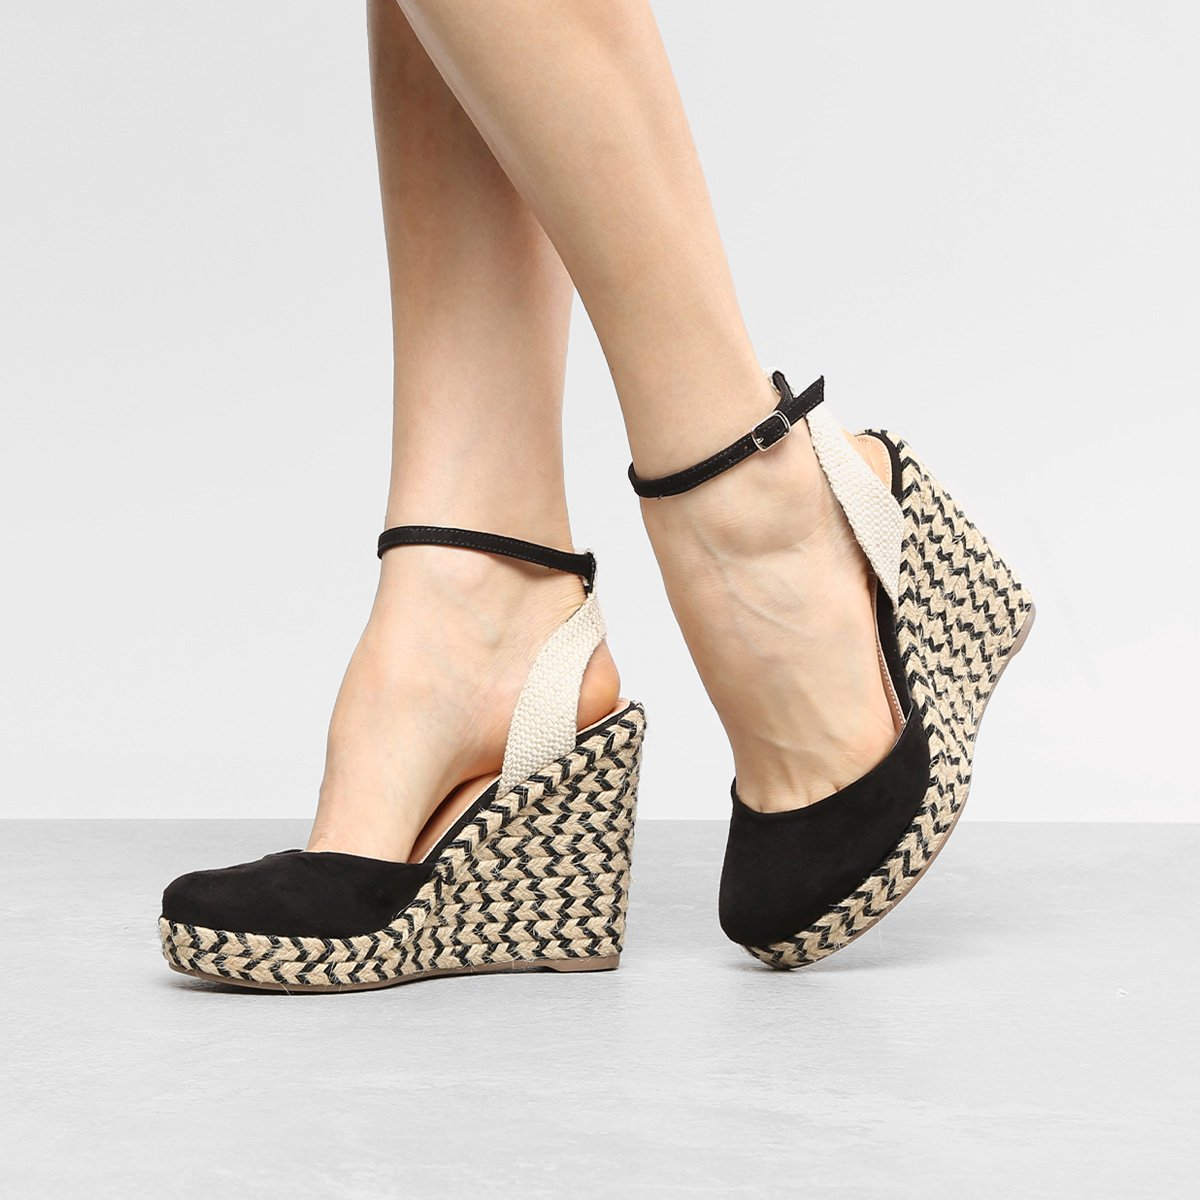 5493d0a3d2 Sandália Anabela Shoestock Espadrille Corda Feminina - Compre Agora ...